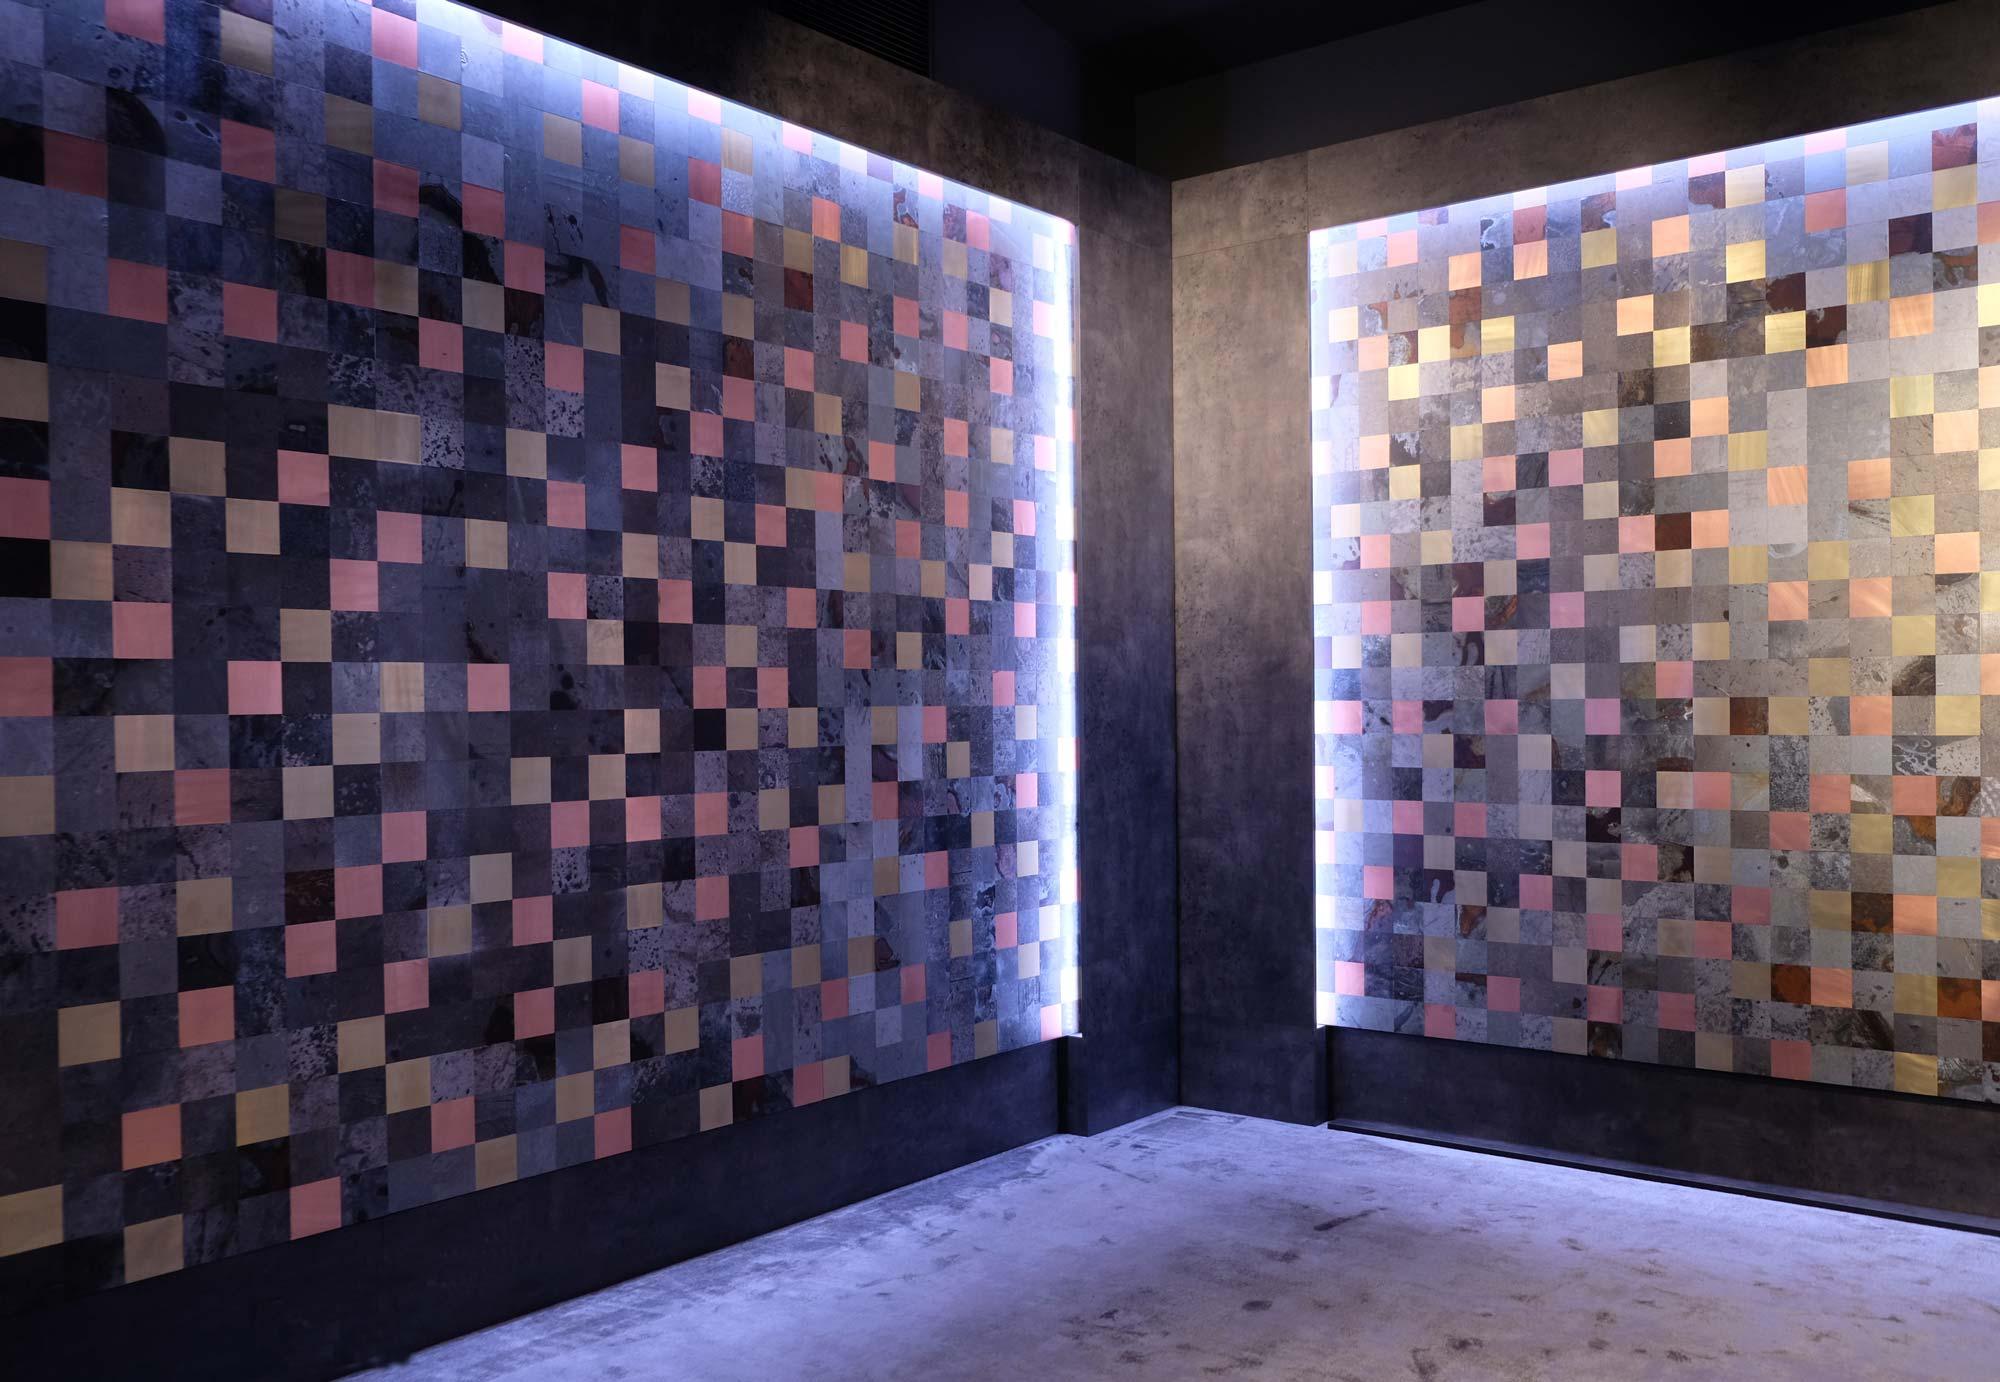 wandpaneele-impressionen-showroom-automatenhersteller-b